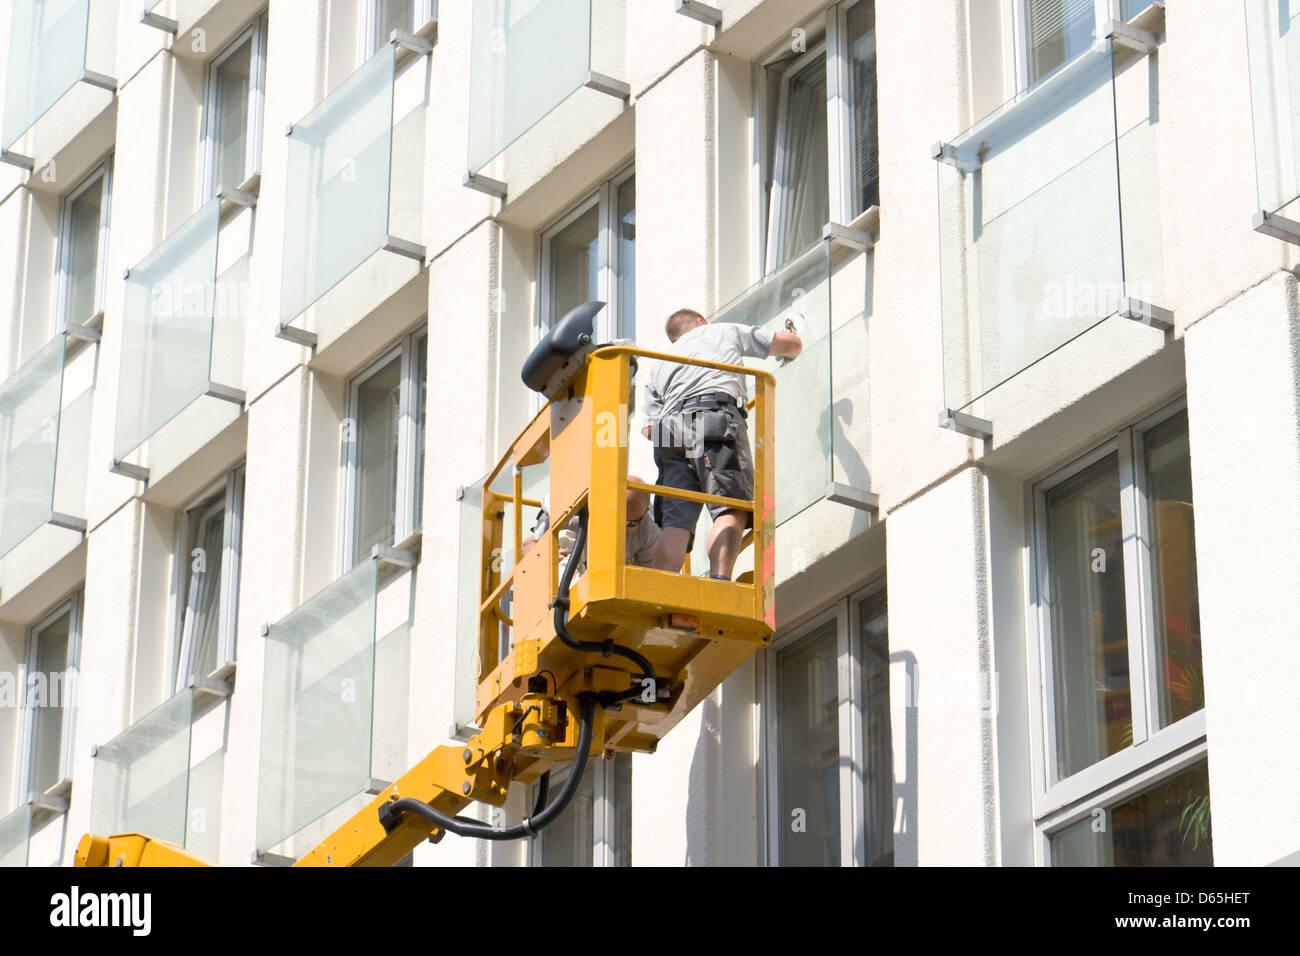 Window cleaner on aerial platform - Stock Image